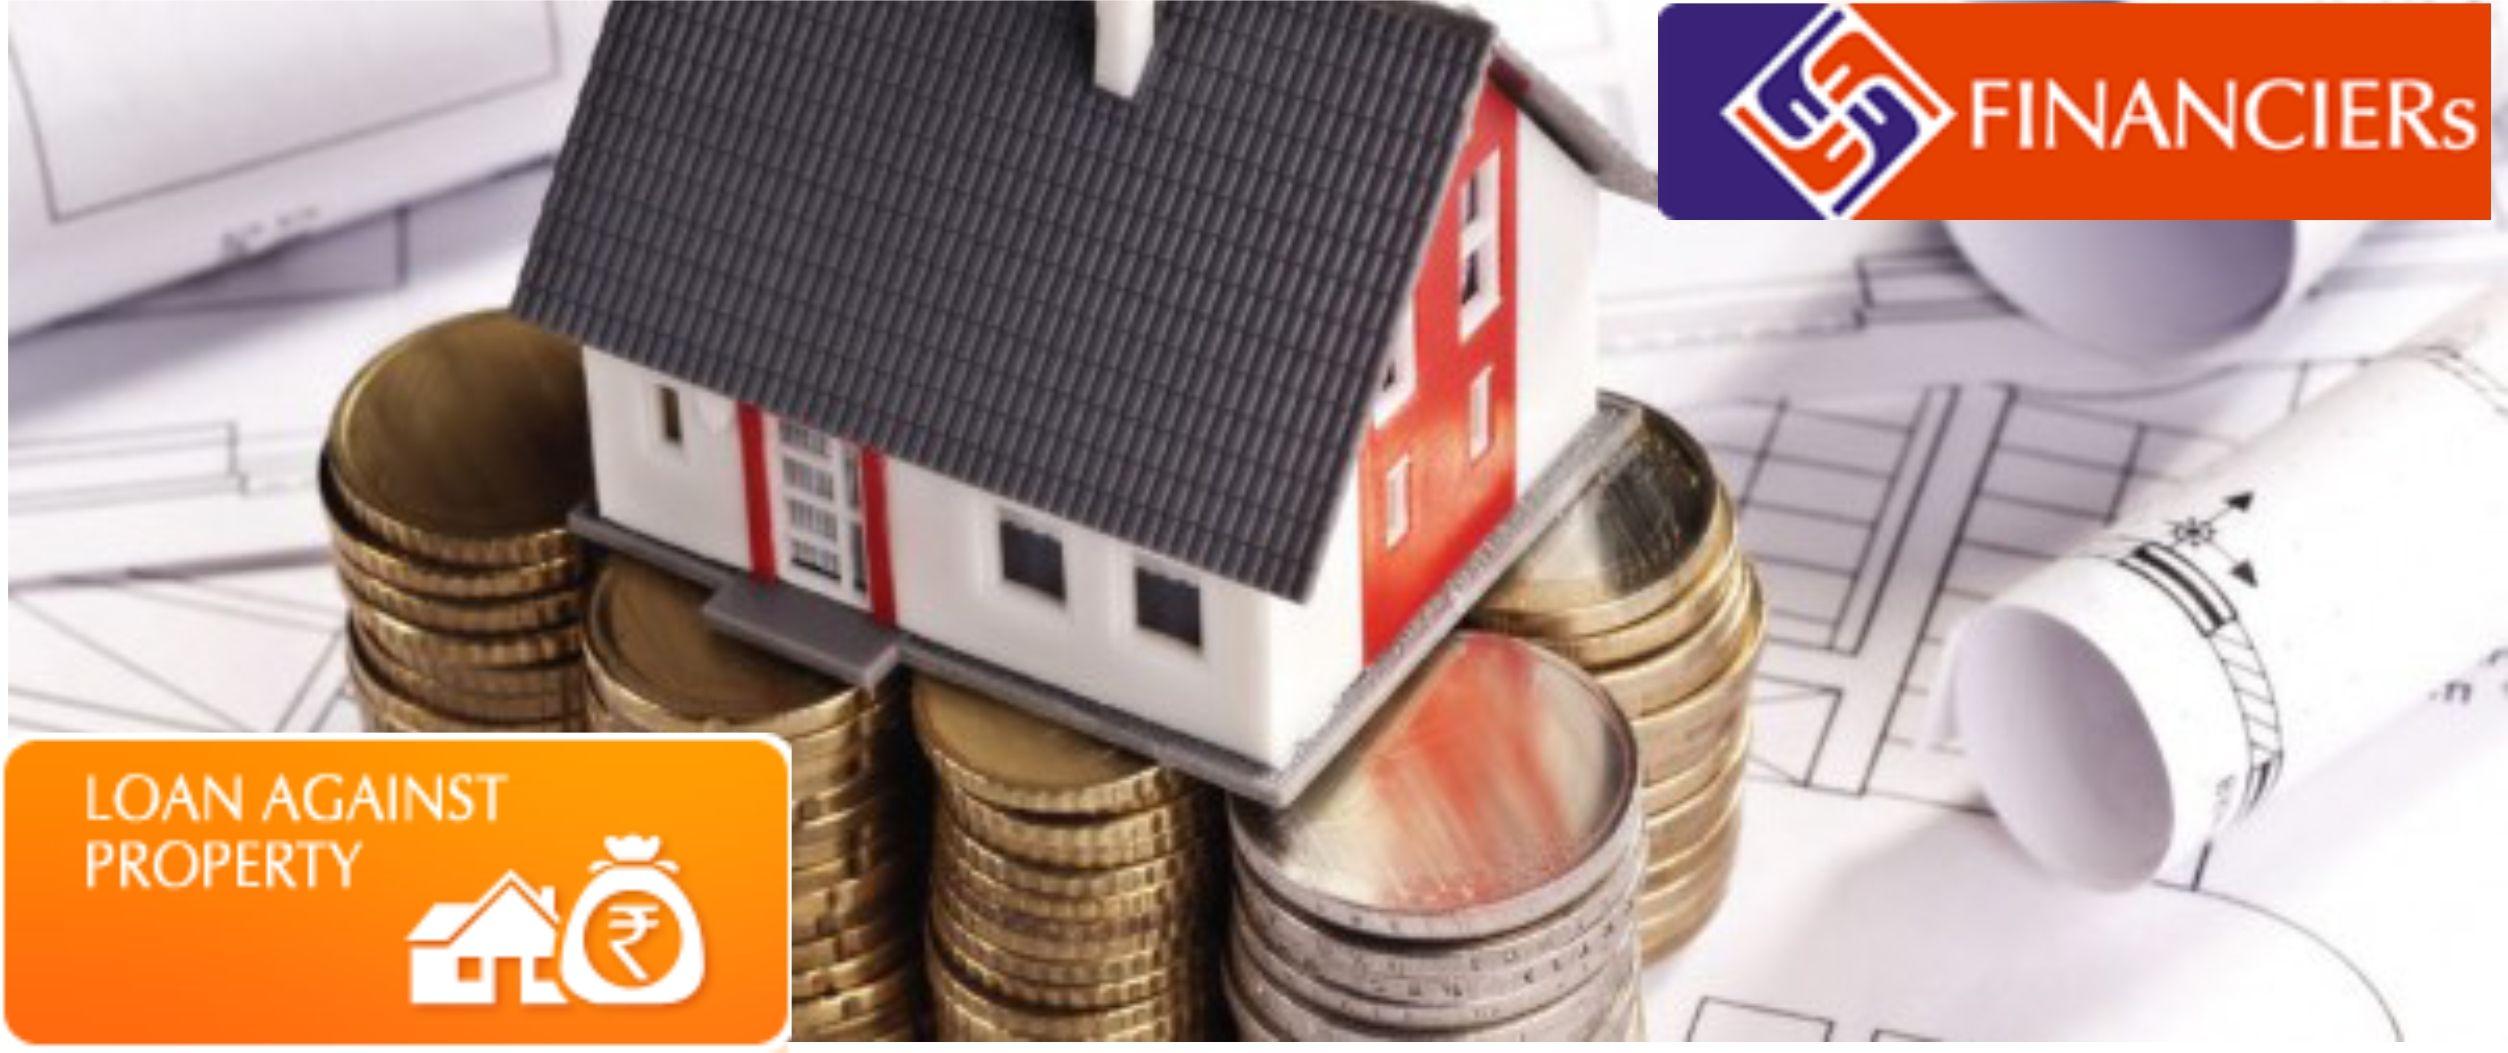 Get An Instant Loan Against Property From Au Financiers Apply Now Www Aufin In Lap Loanagainstproperty Finance Instant Loans Finance Bank Finance